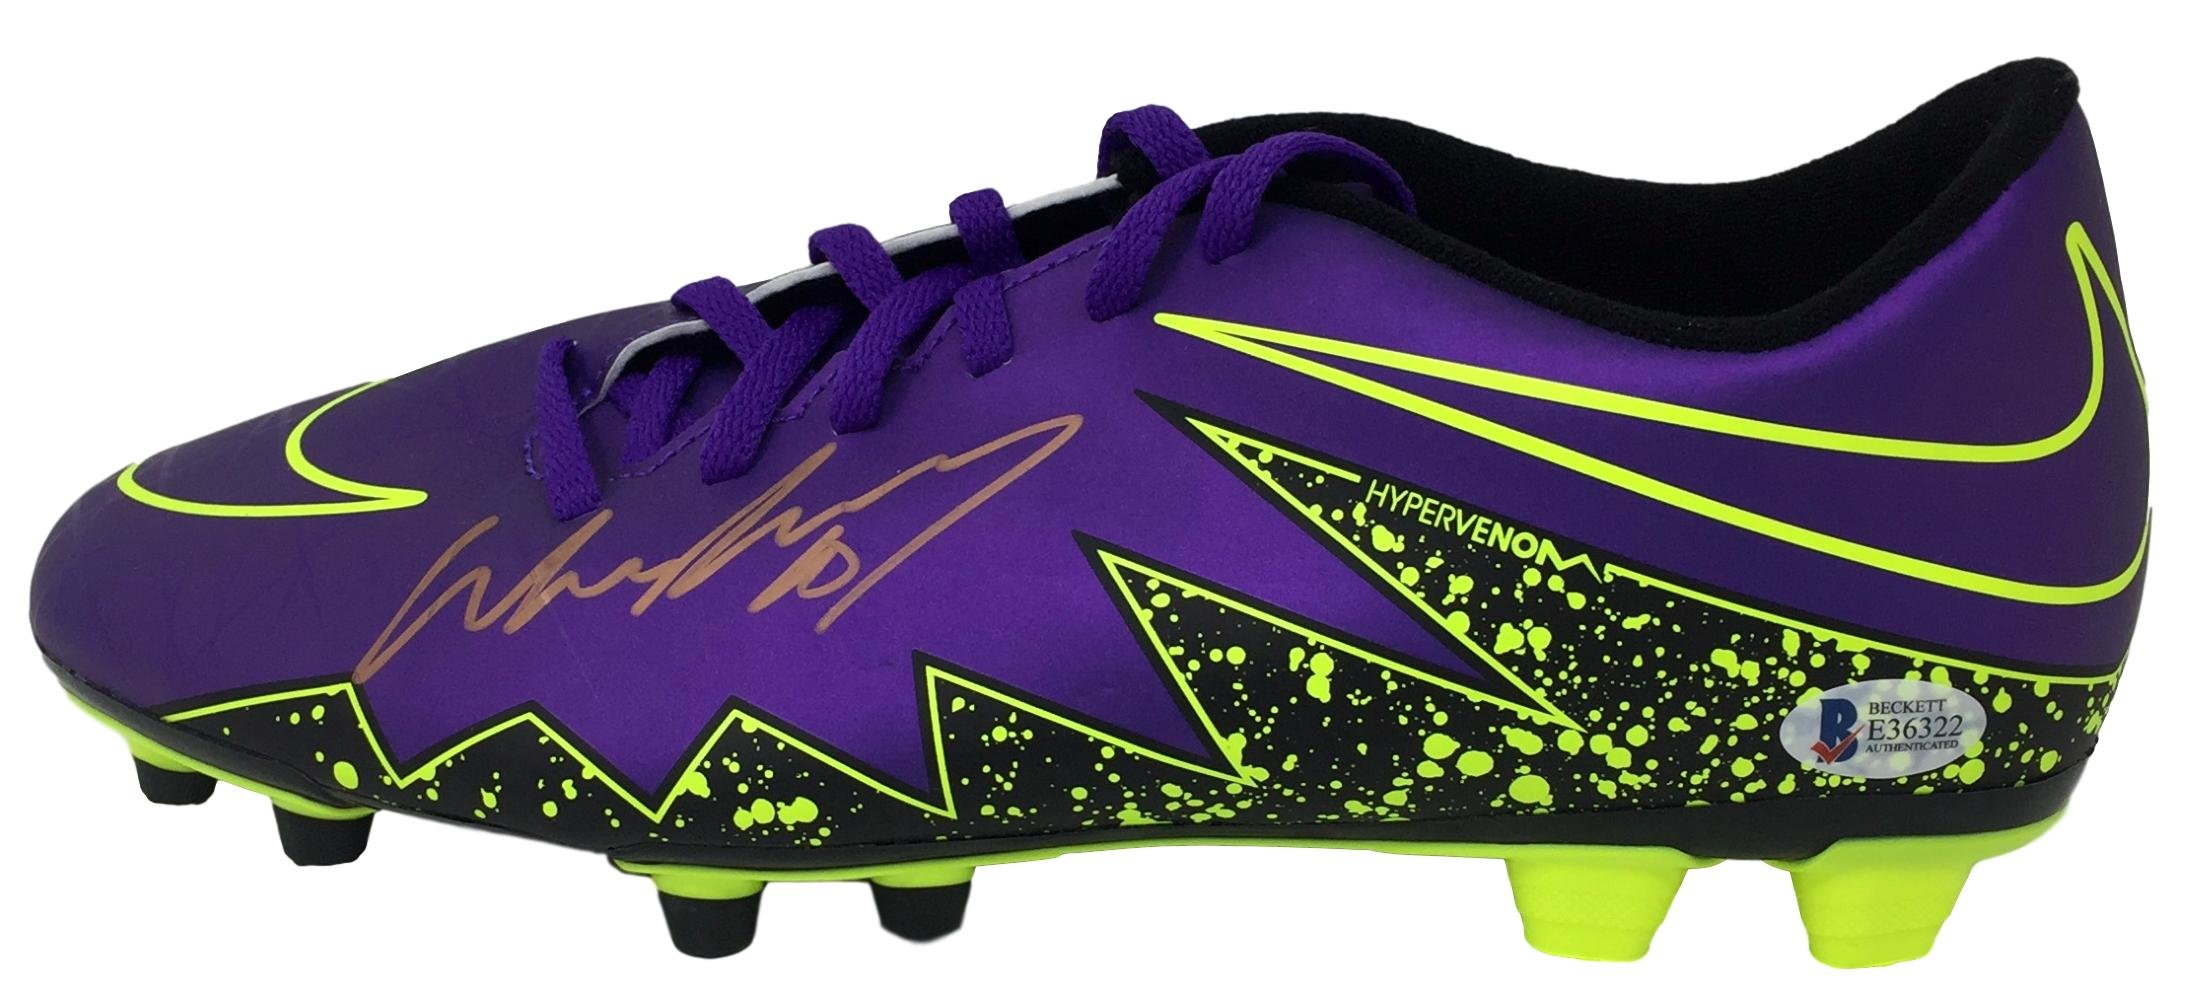 Wayne Rooney Signed Purple Nike Hypervenom Soccer Left Cleat BAS